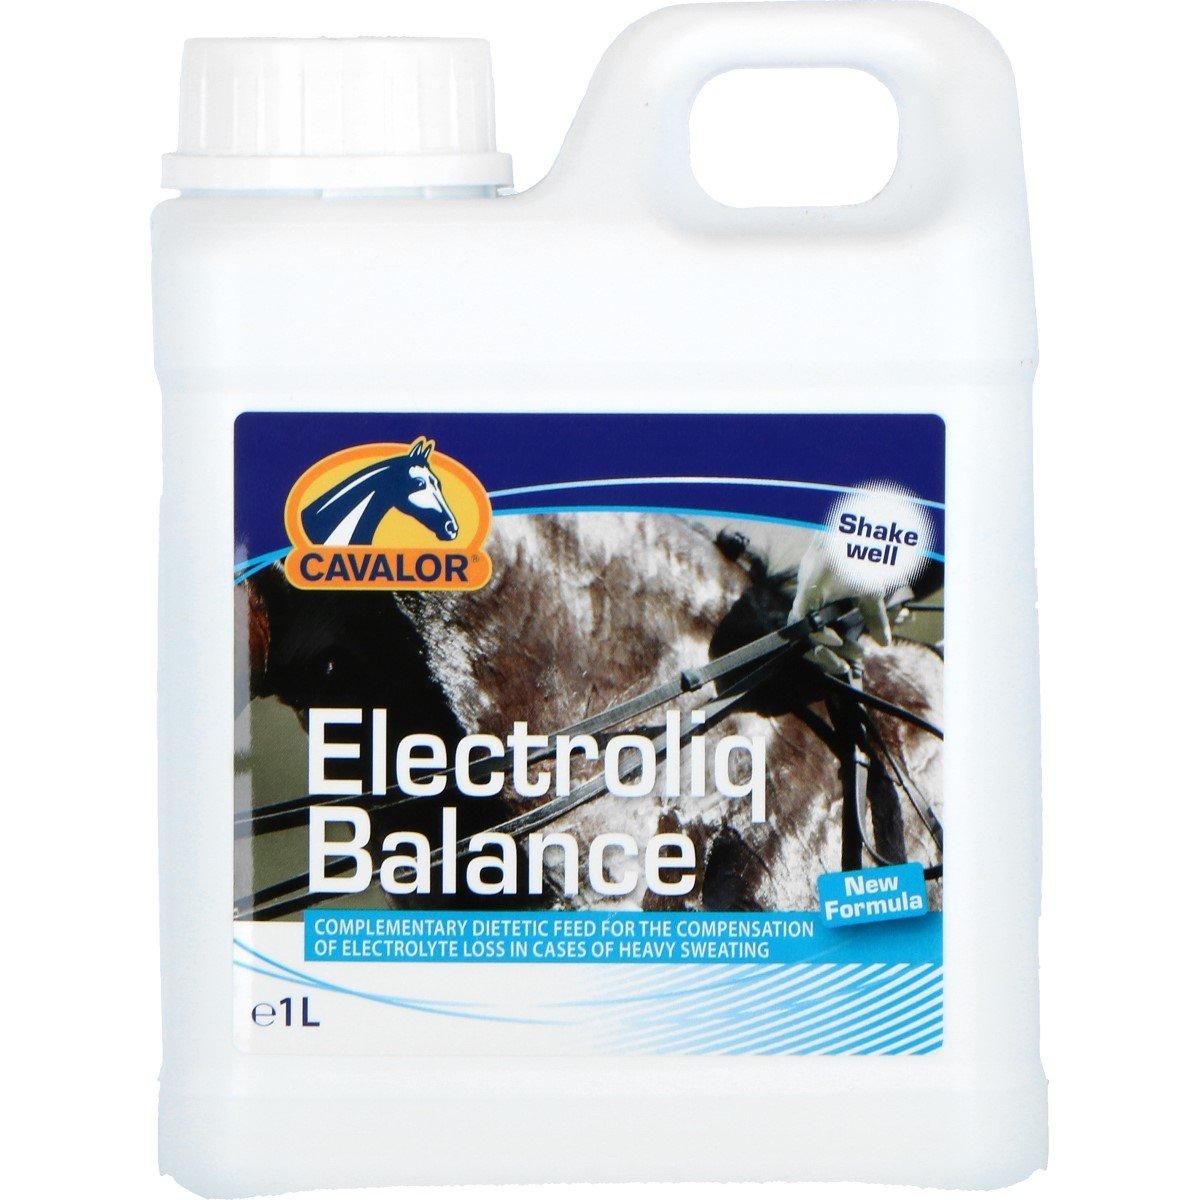 Afbeelding van Cavalor Electroliq Balance 1ltr